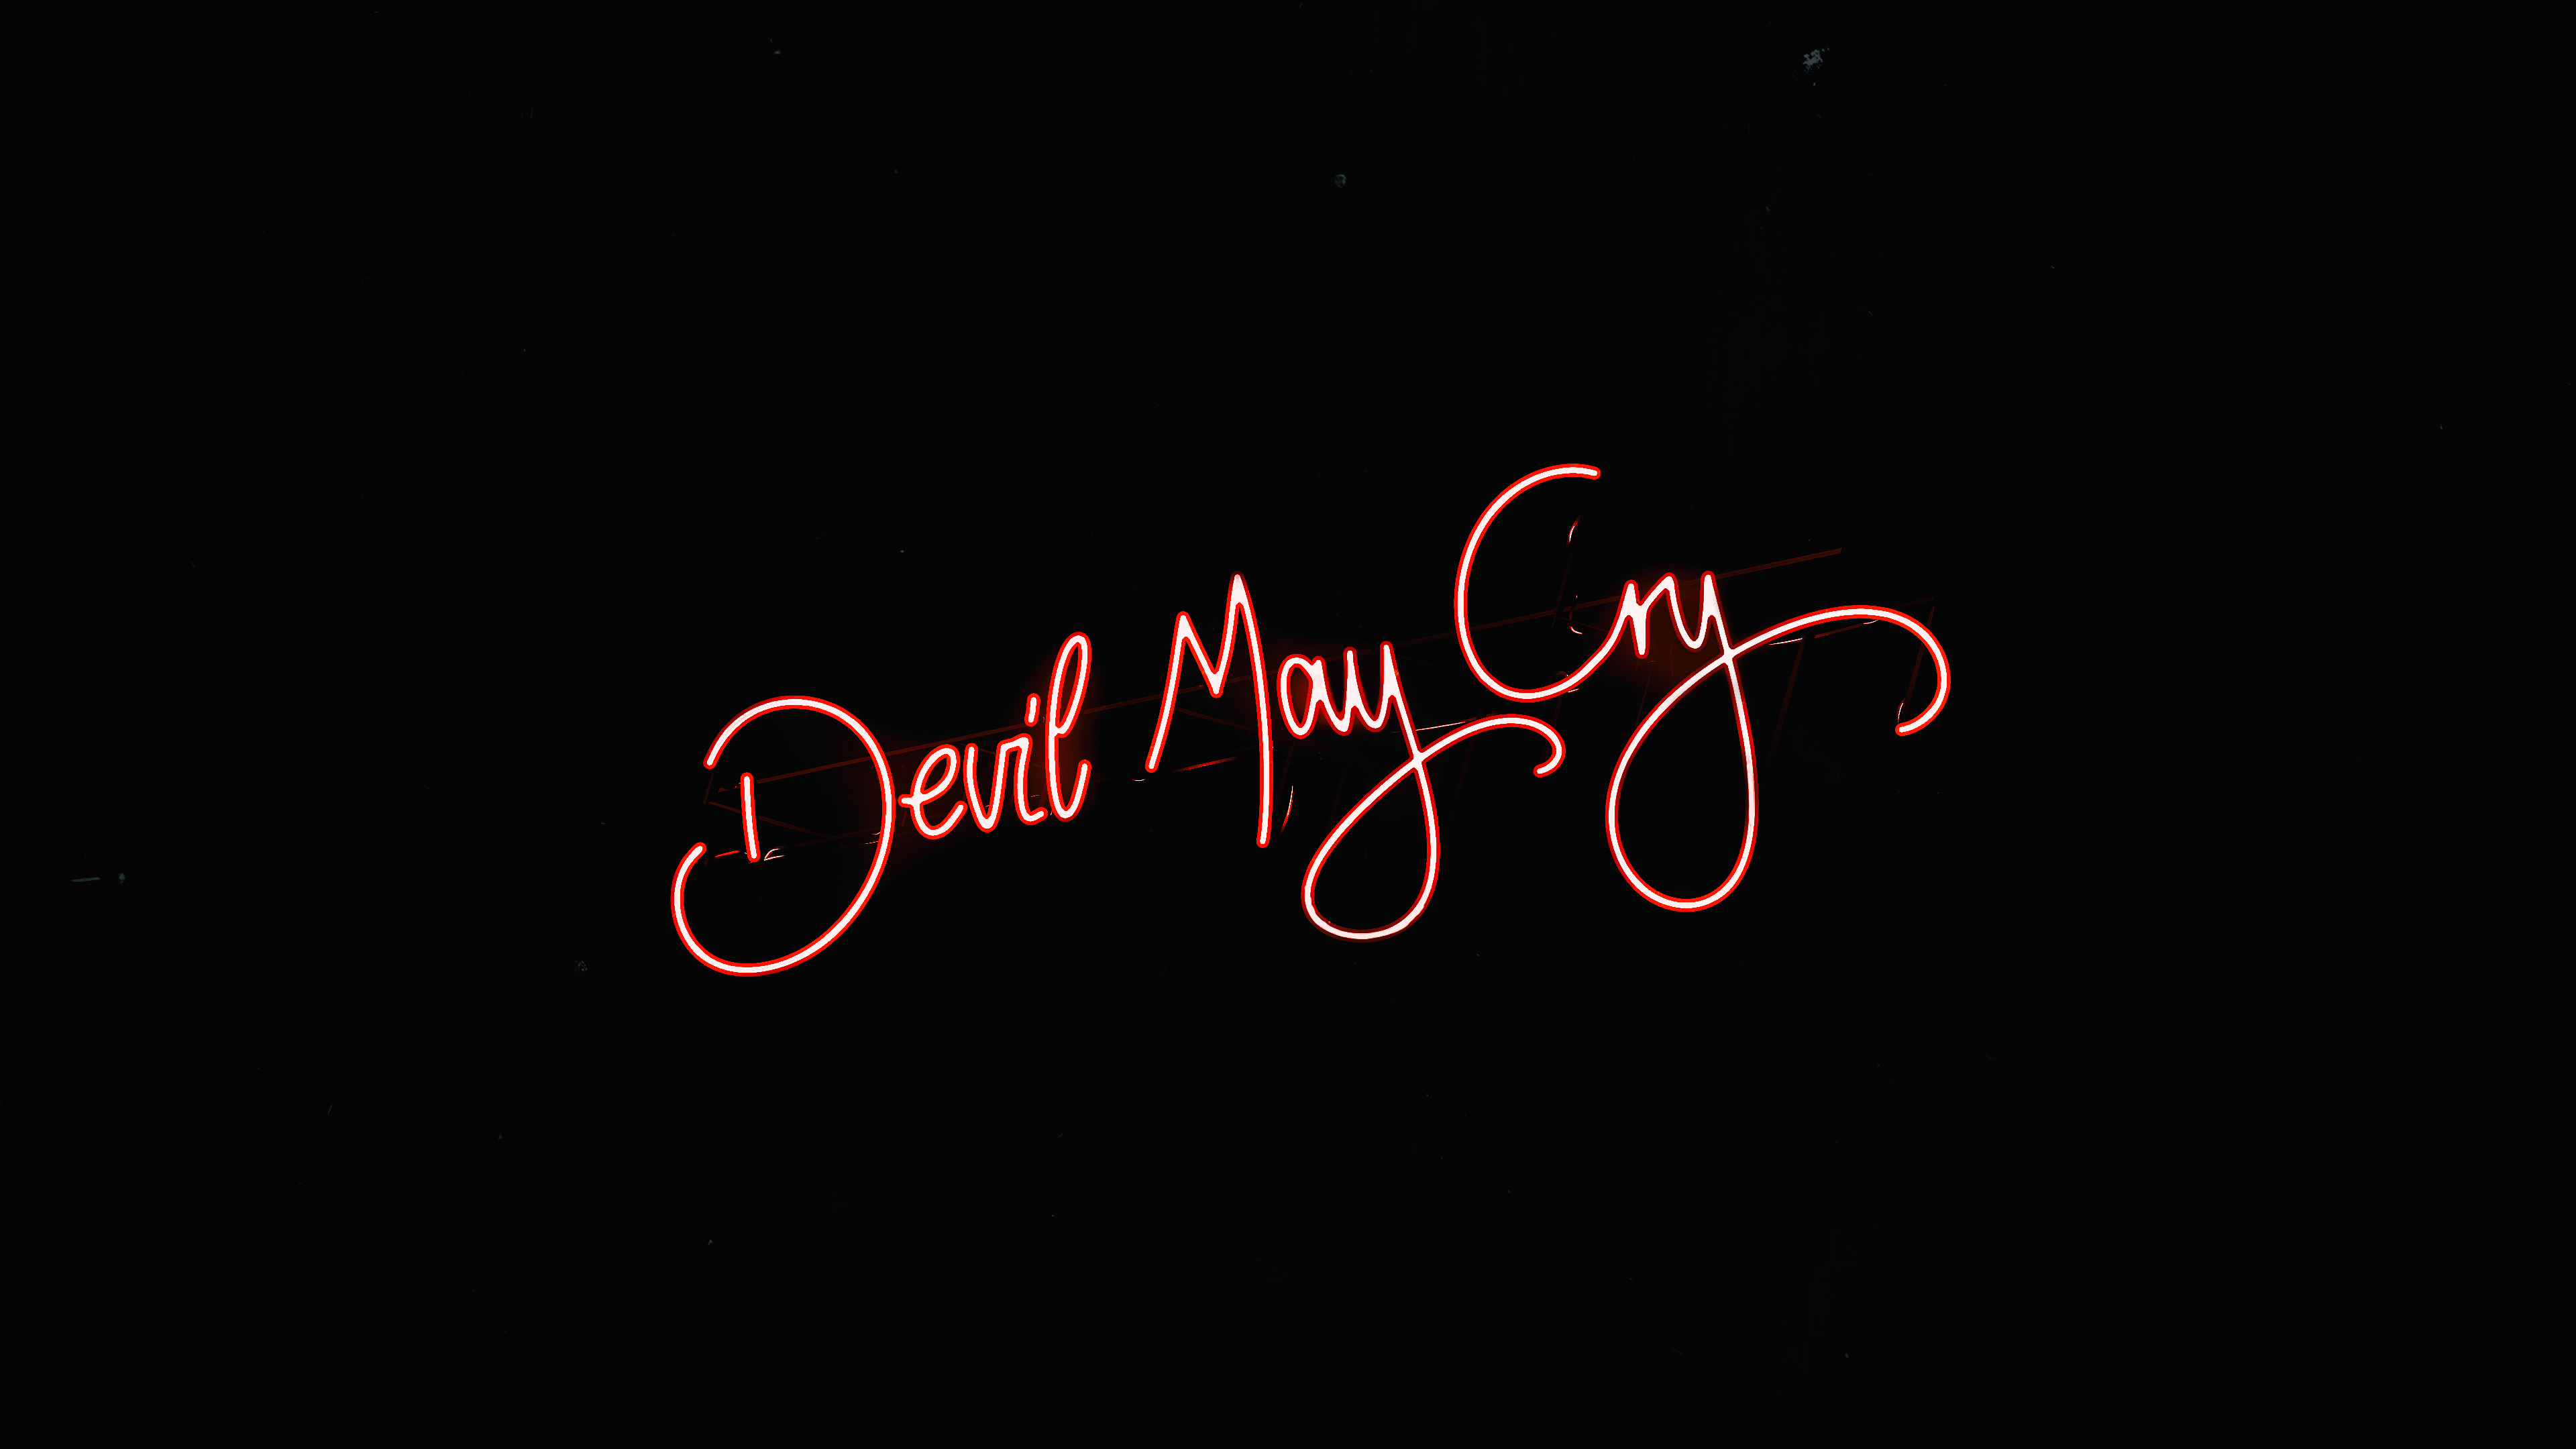 Devil May Cry 5 Logo 4k Wallpaper 91